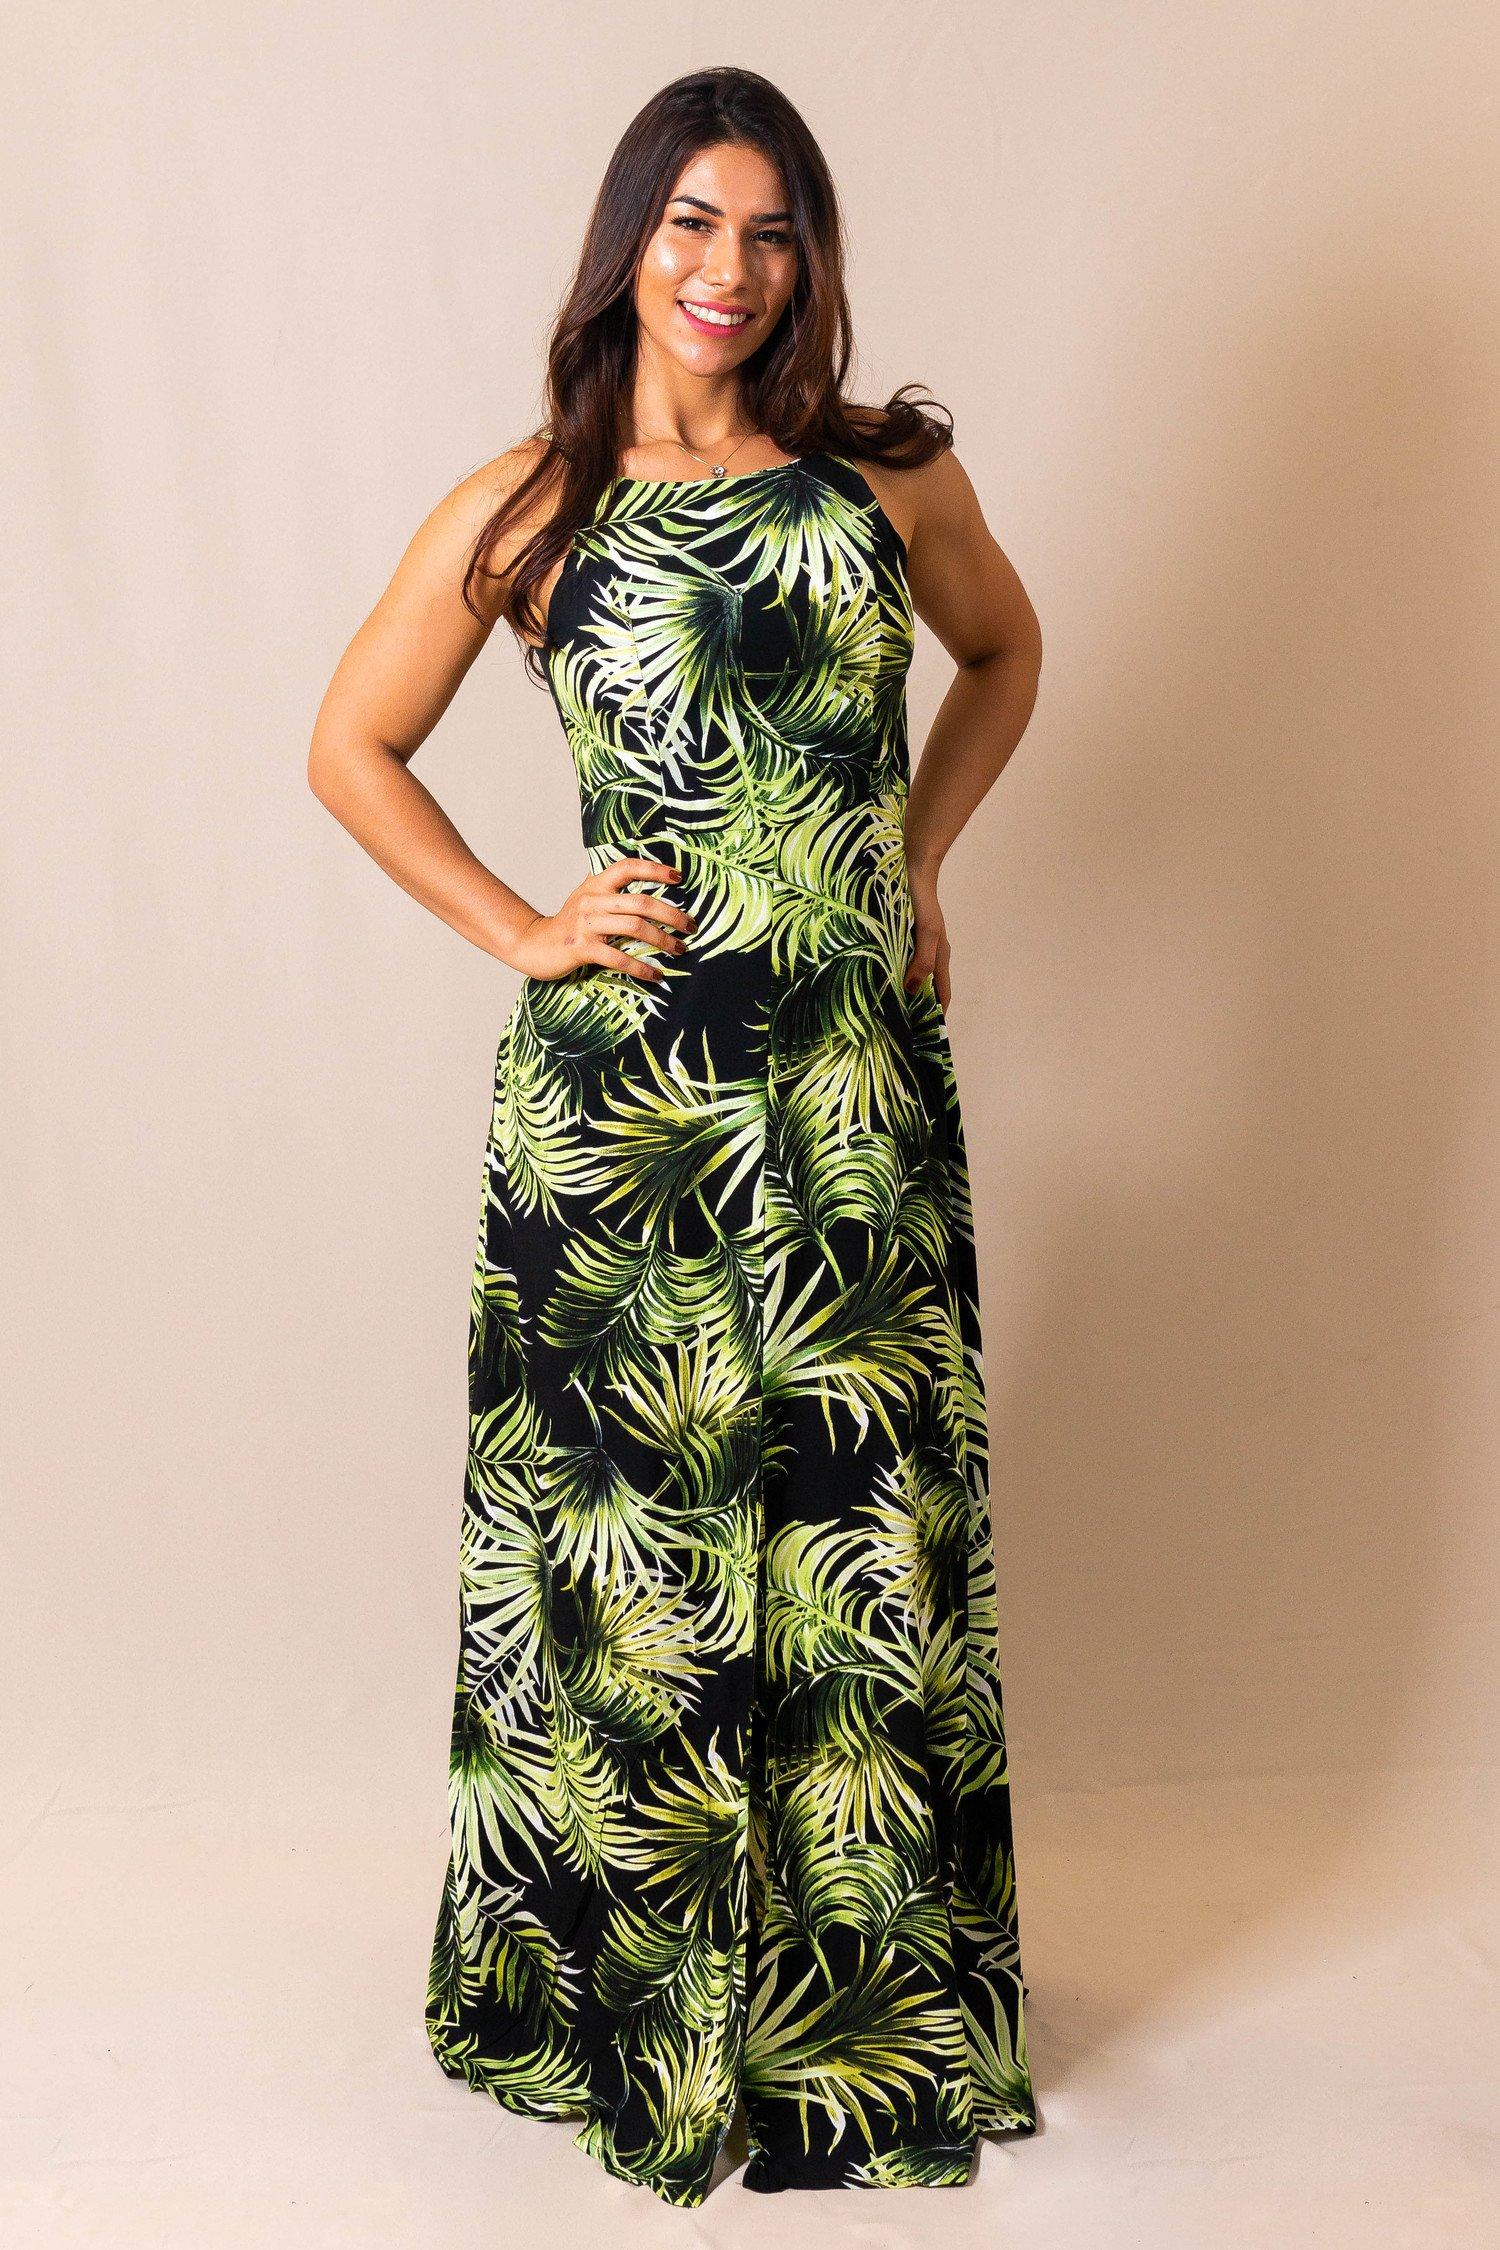 Vestido Longo Preto Estampa Folhas Verdes Pitanga Doce